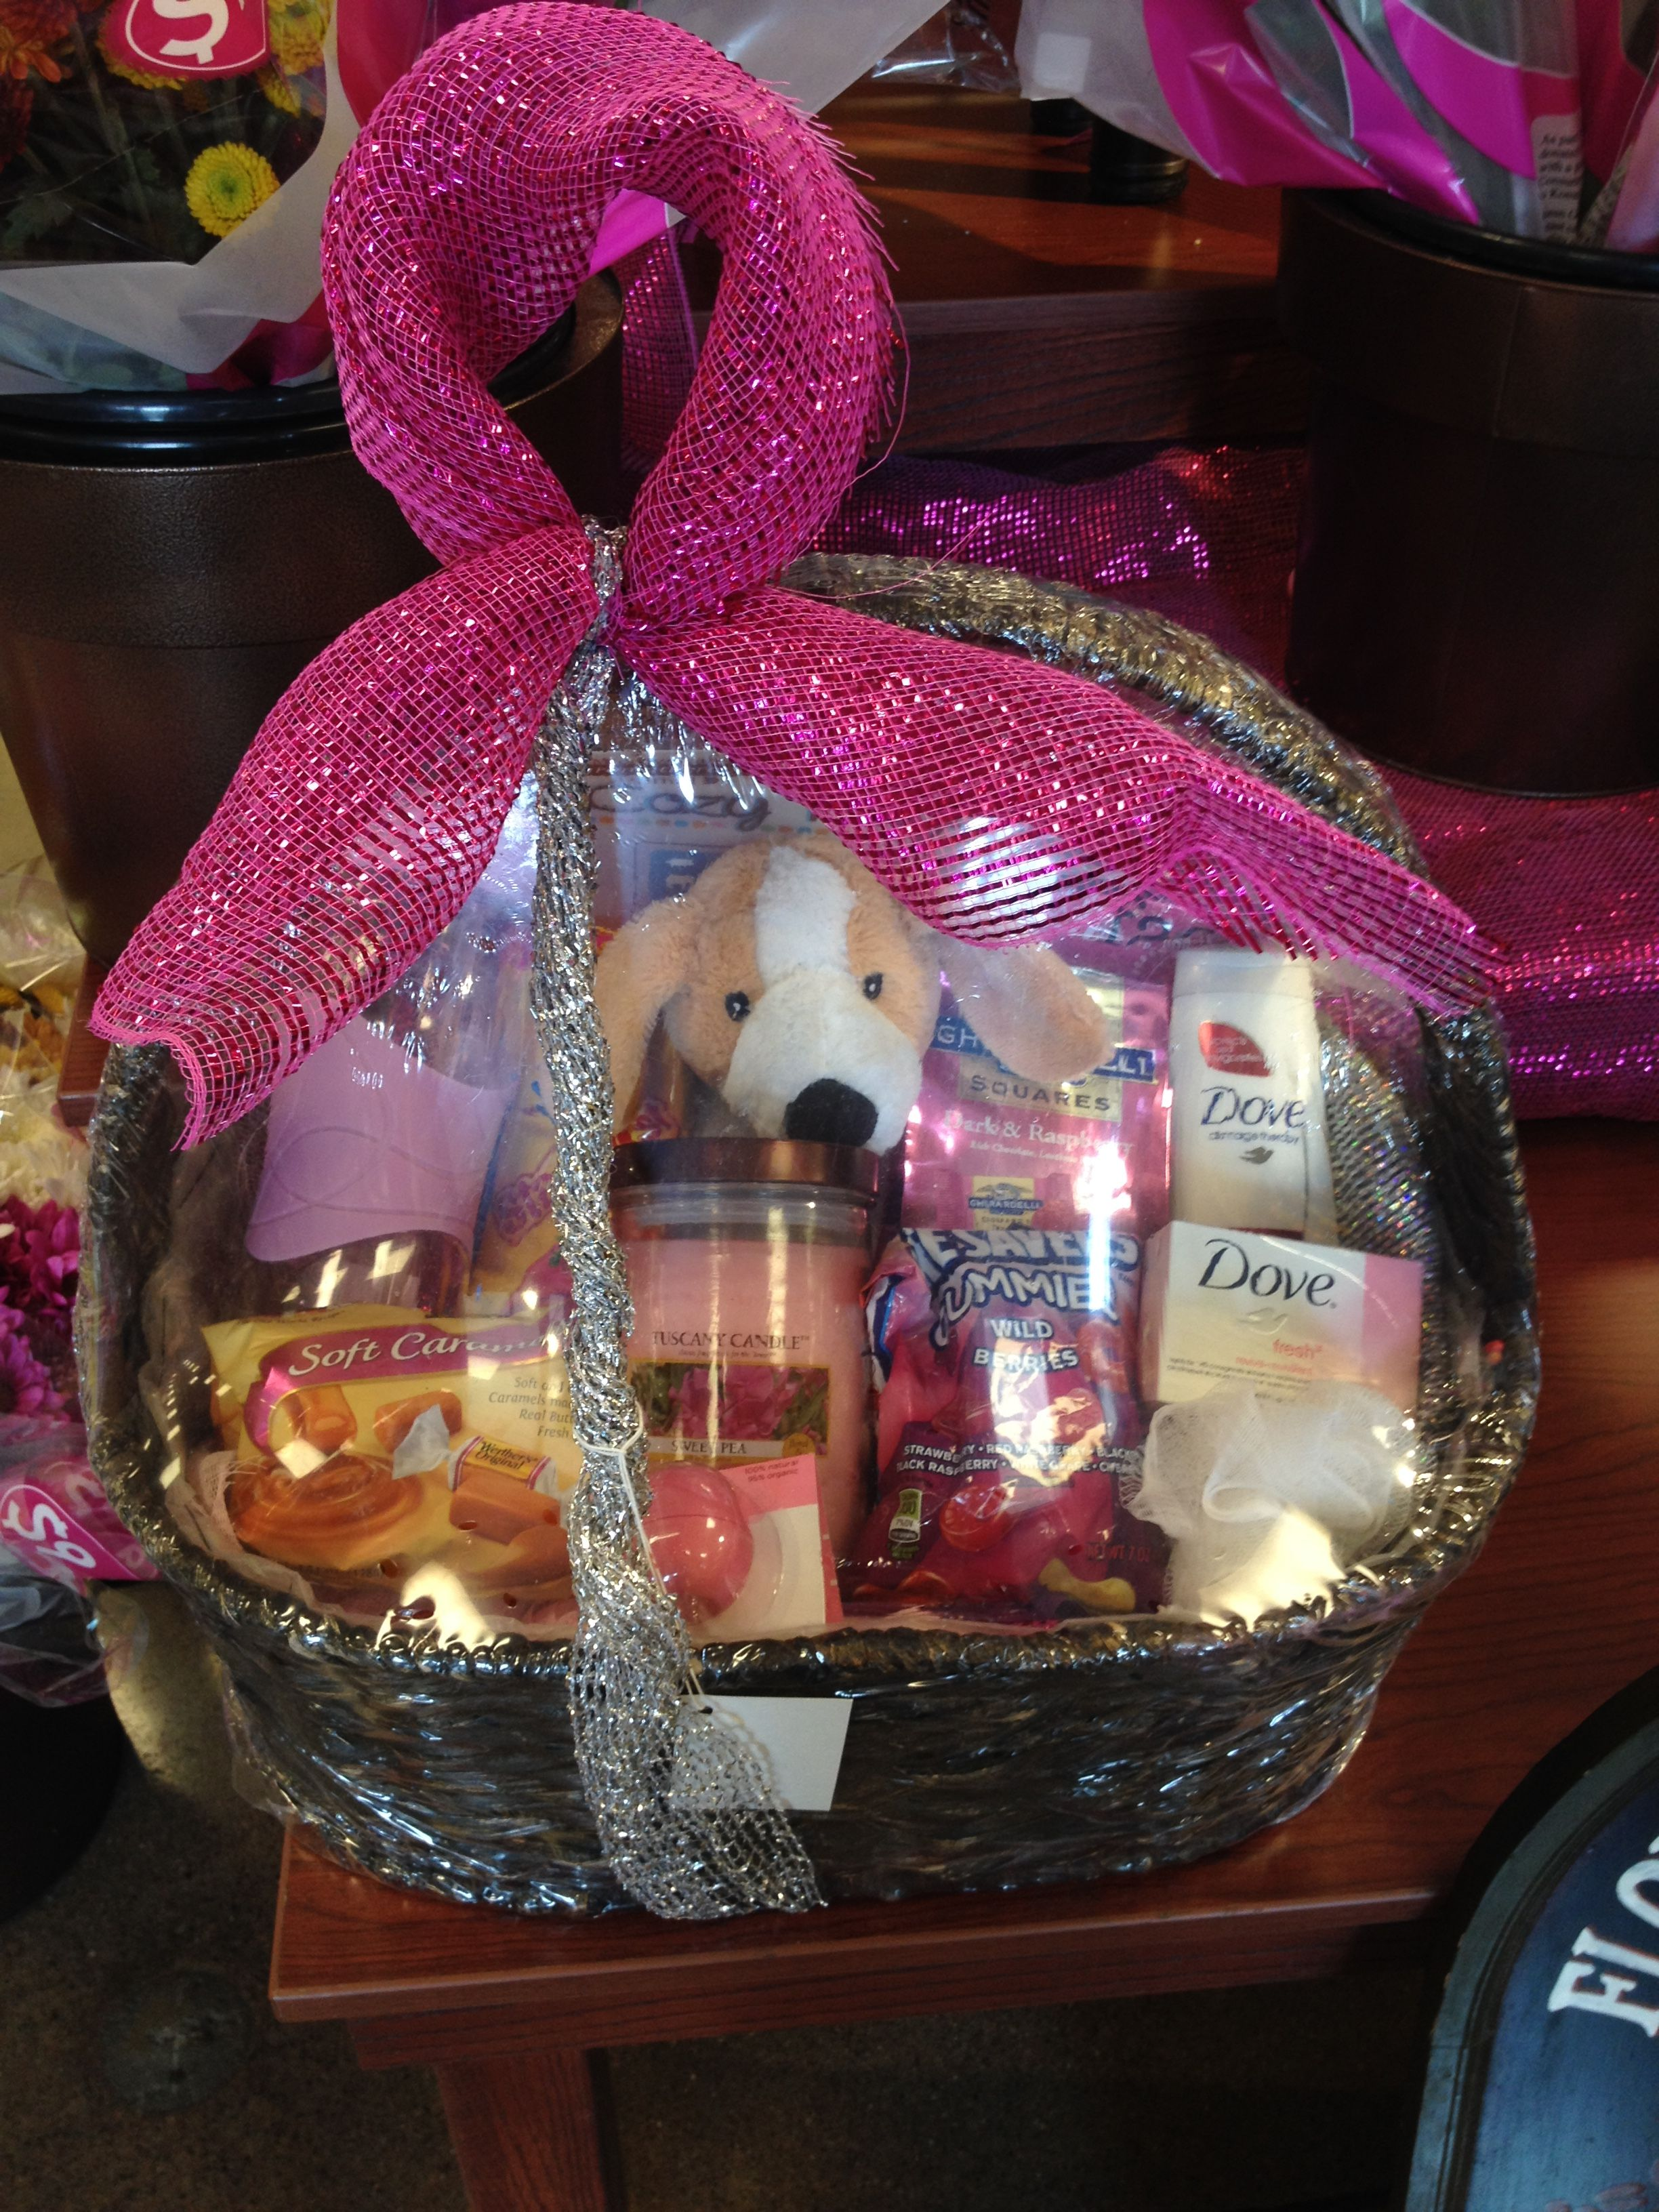 pink ribbon breast cancer awarenessgift basket for women